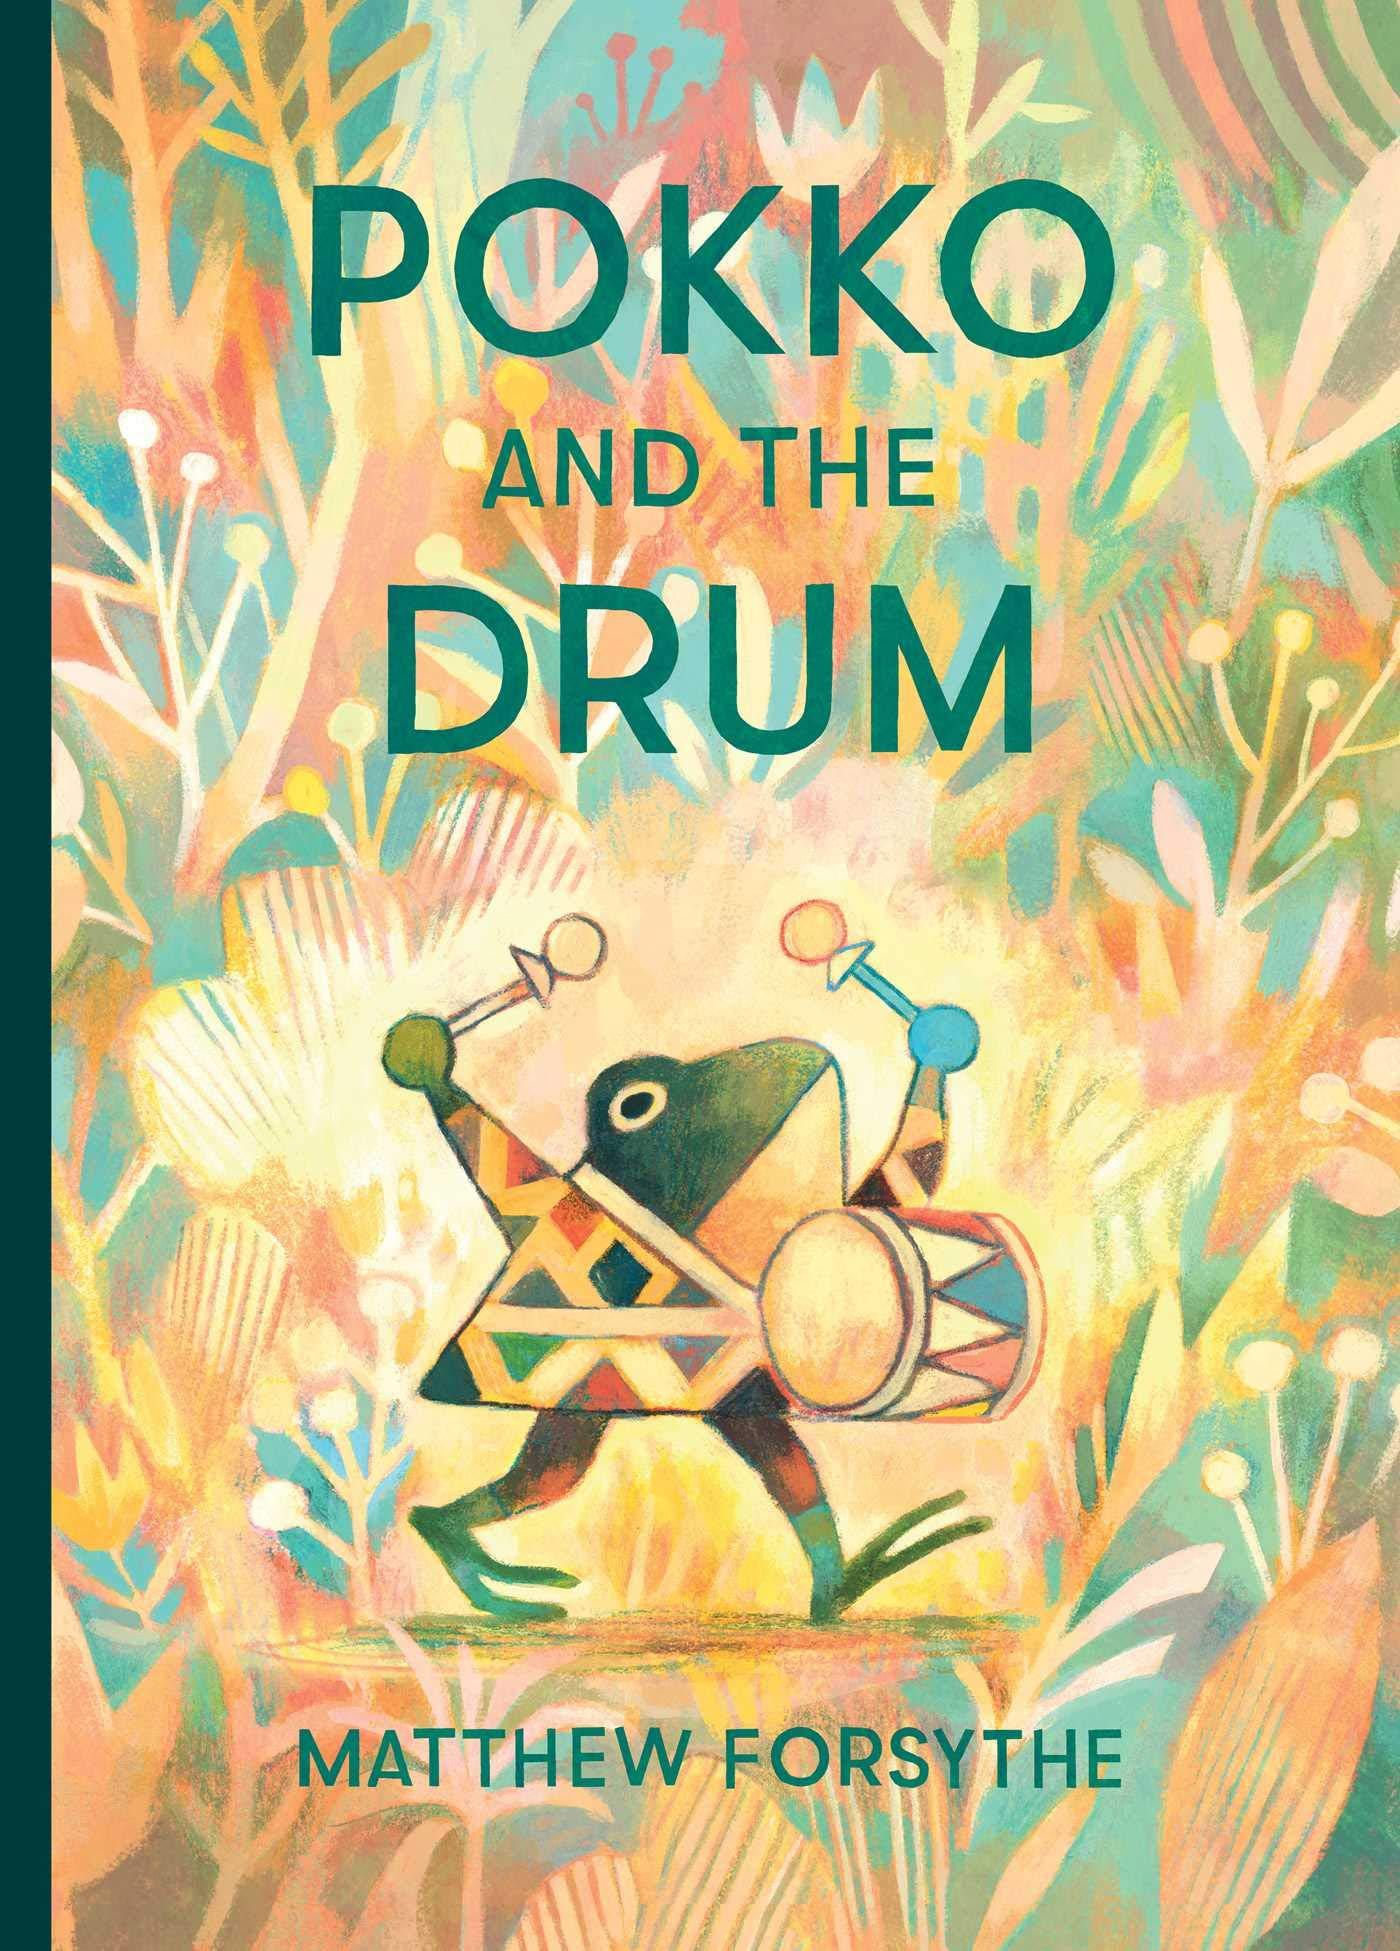 celebrate-picture-books-picture-book-review-pokko-and-the-drum-cover